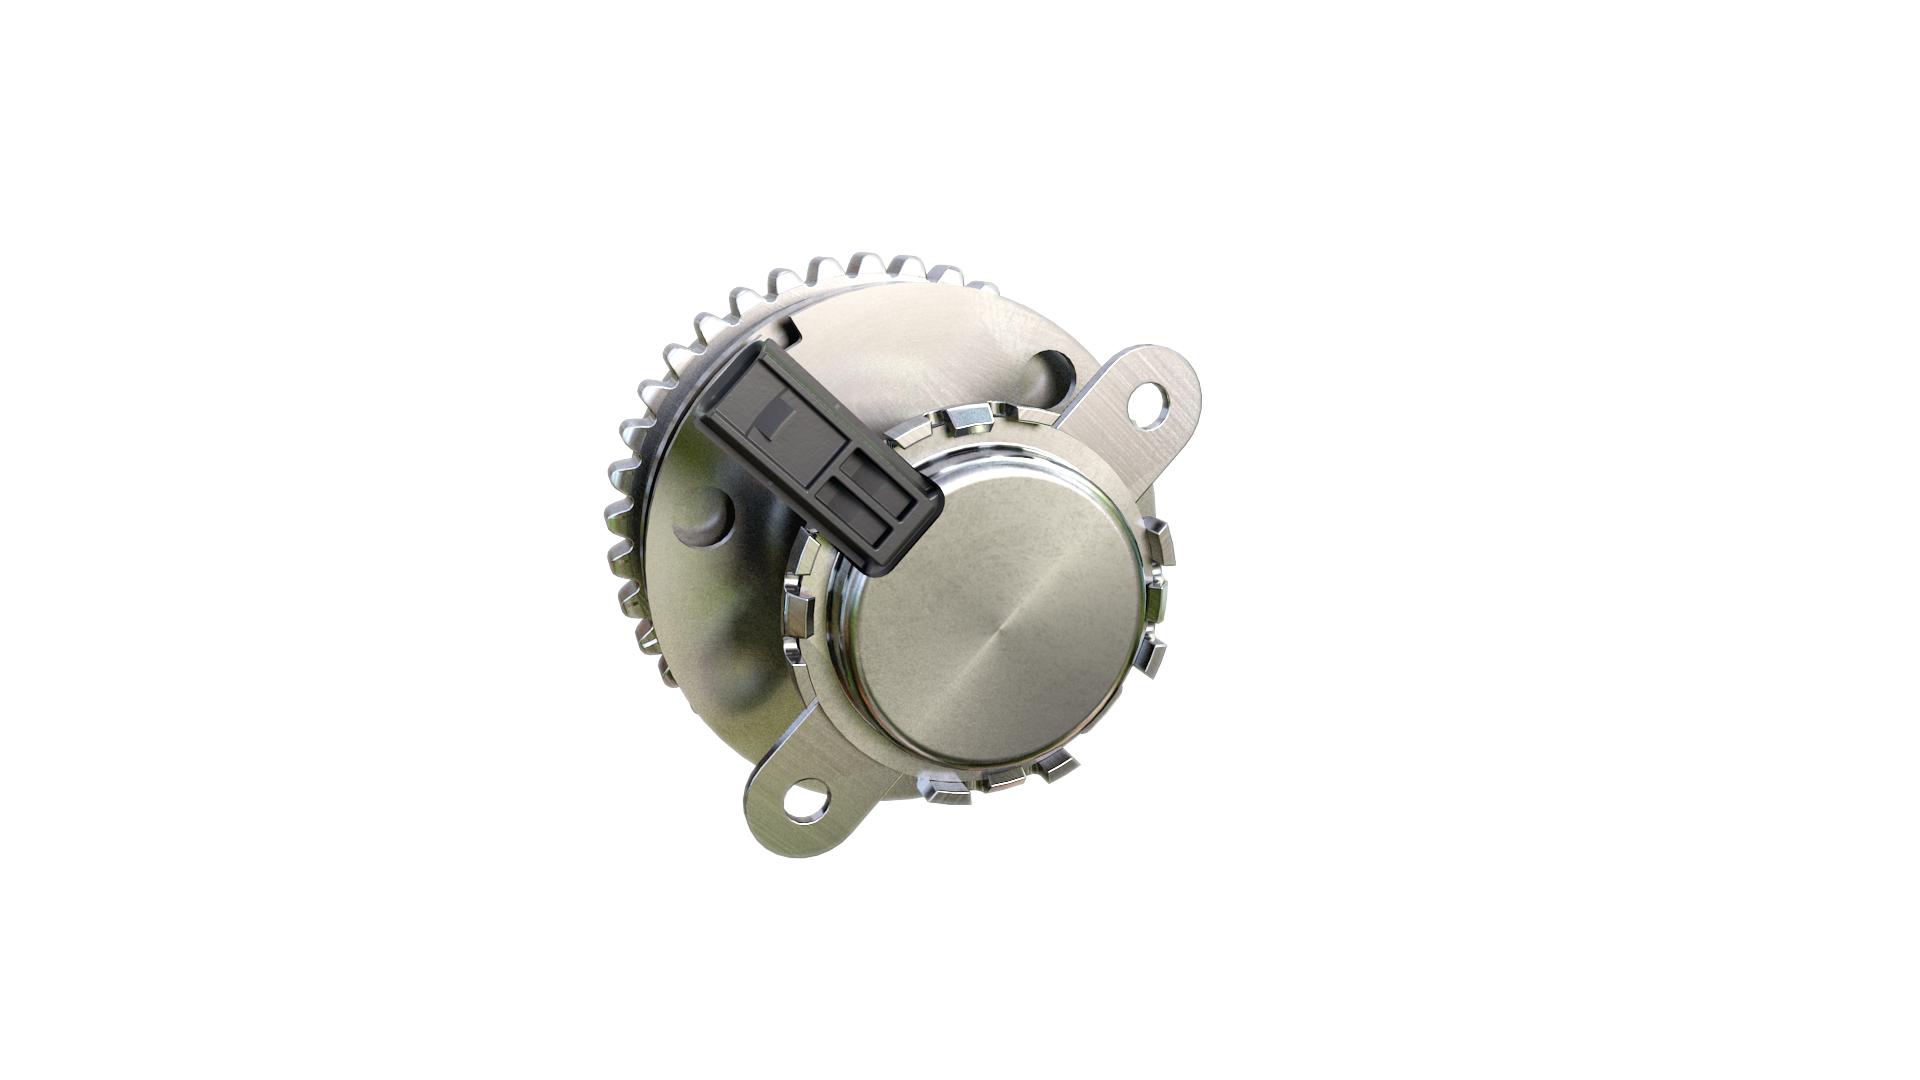 BorgWarner variable cam timing (VCT) phasers